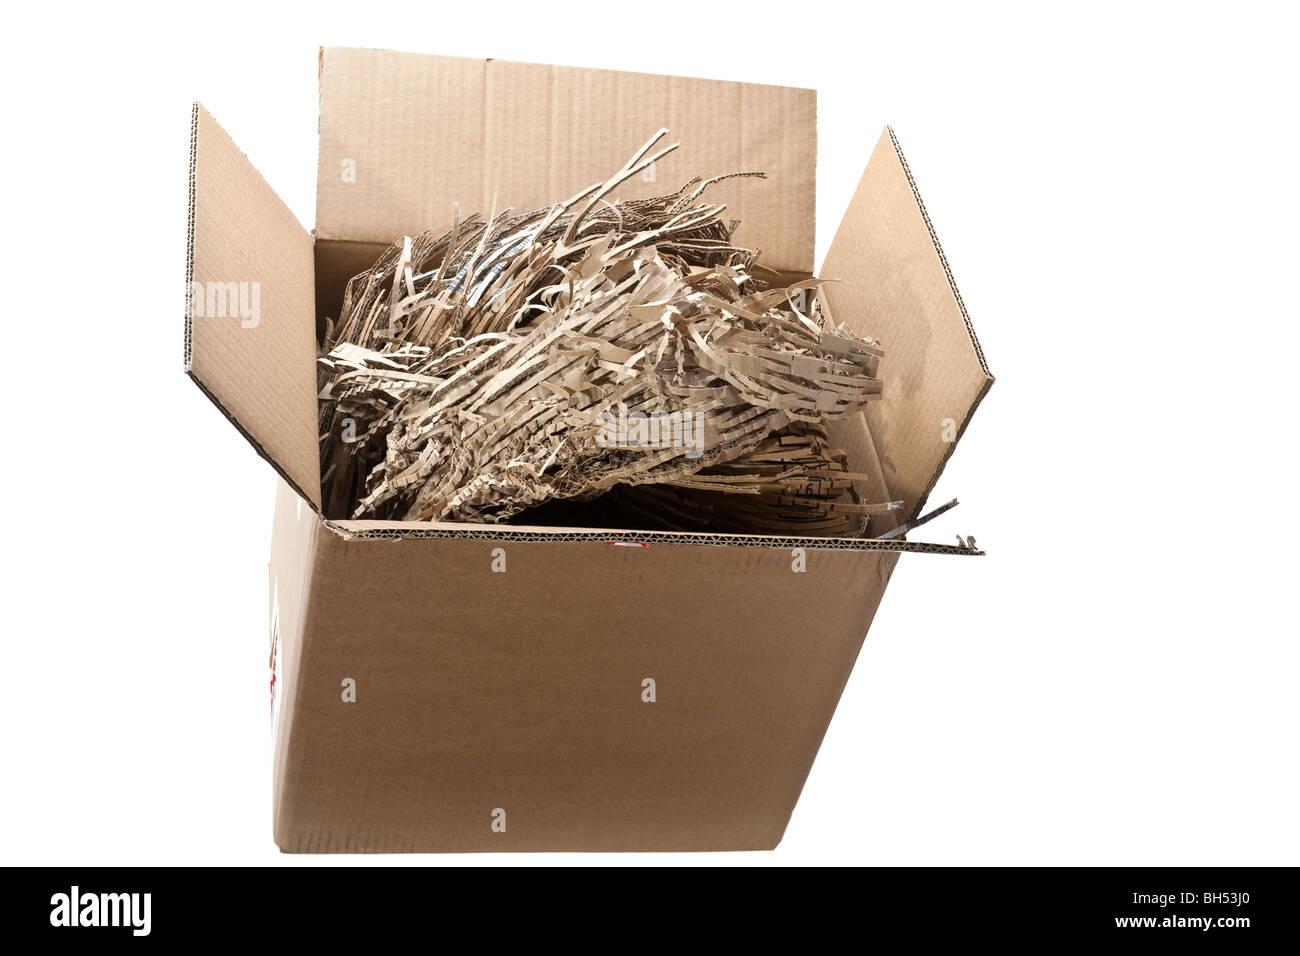 Karton voller zerkleinerte Pappe Recycling Verpackungsmaterial Stockbild